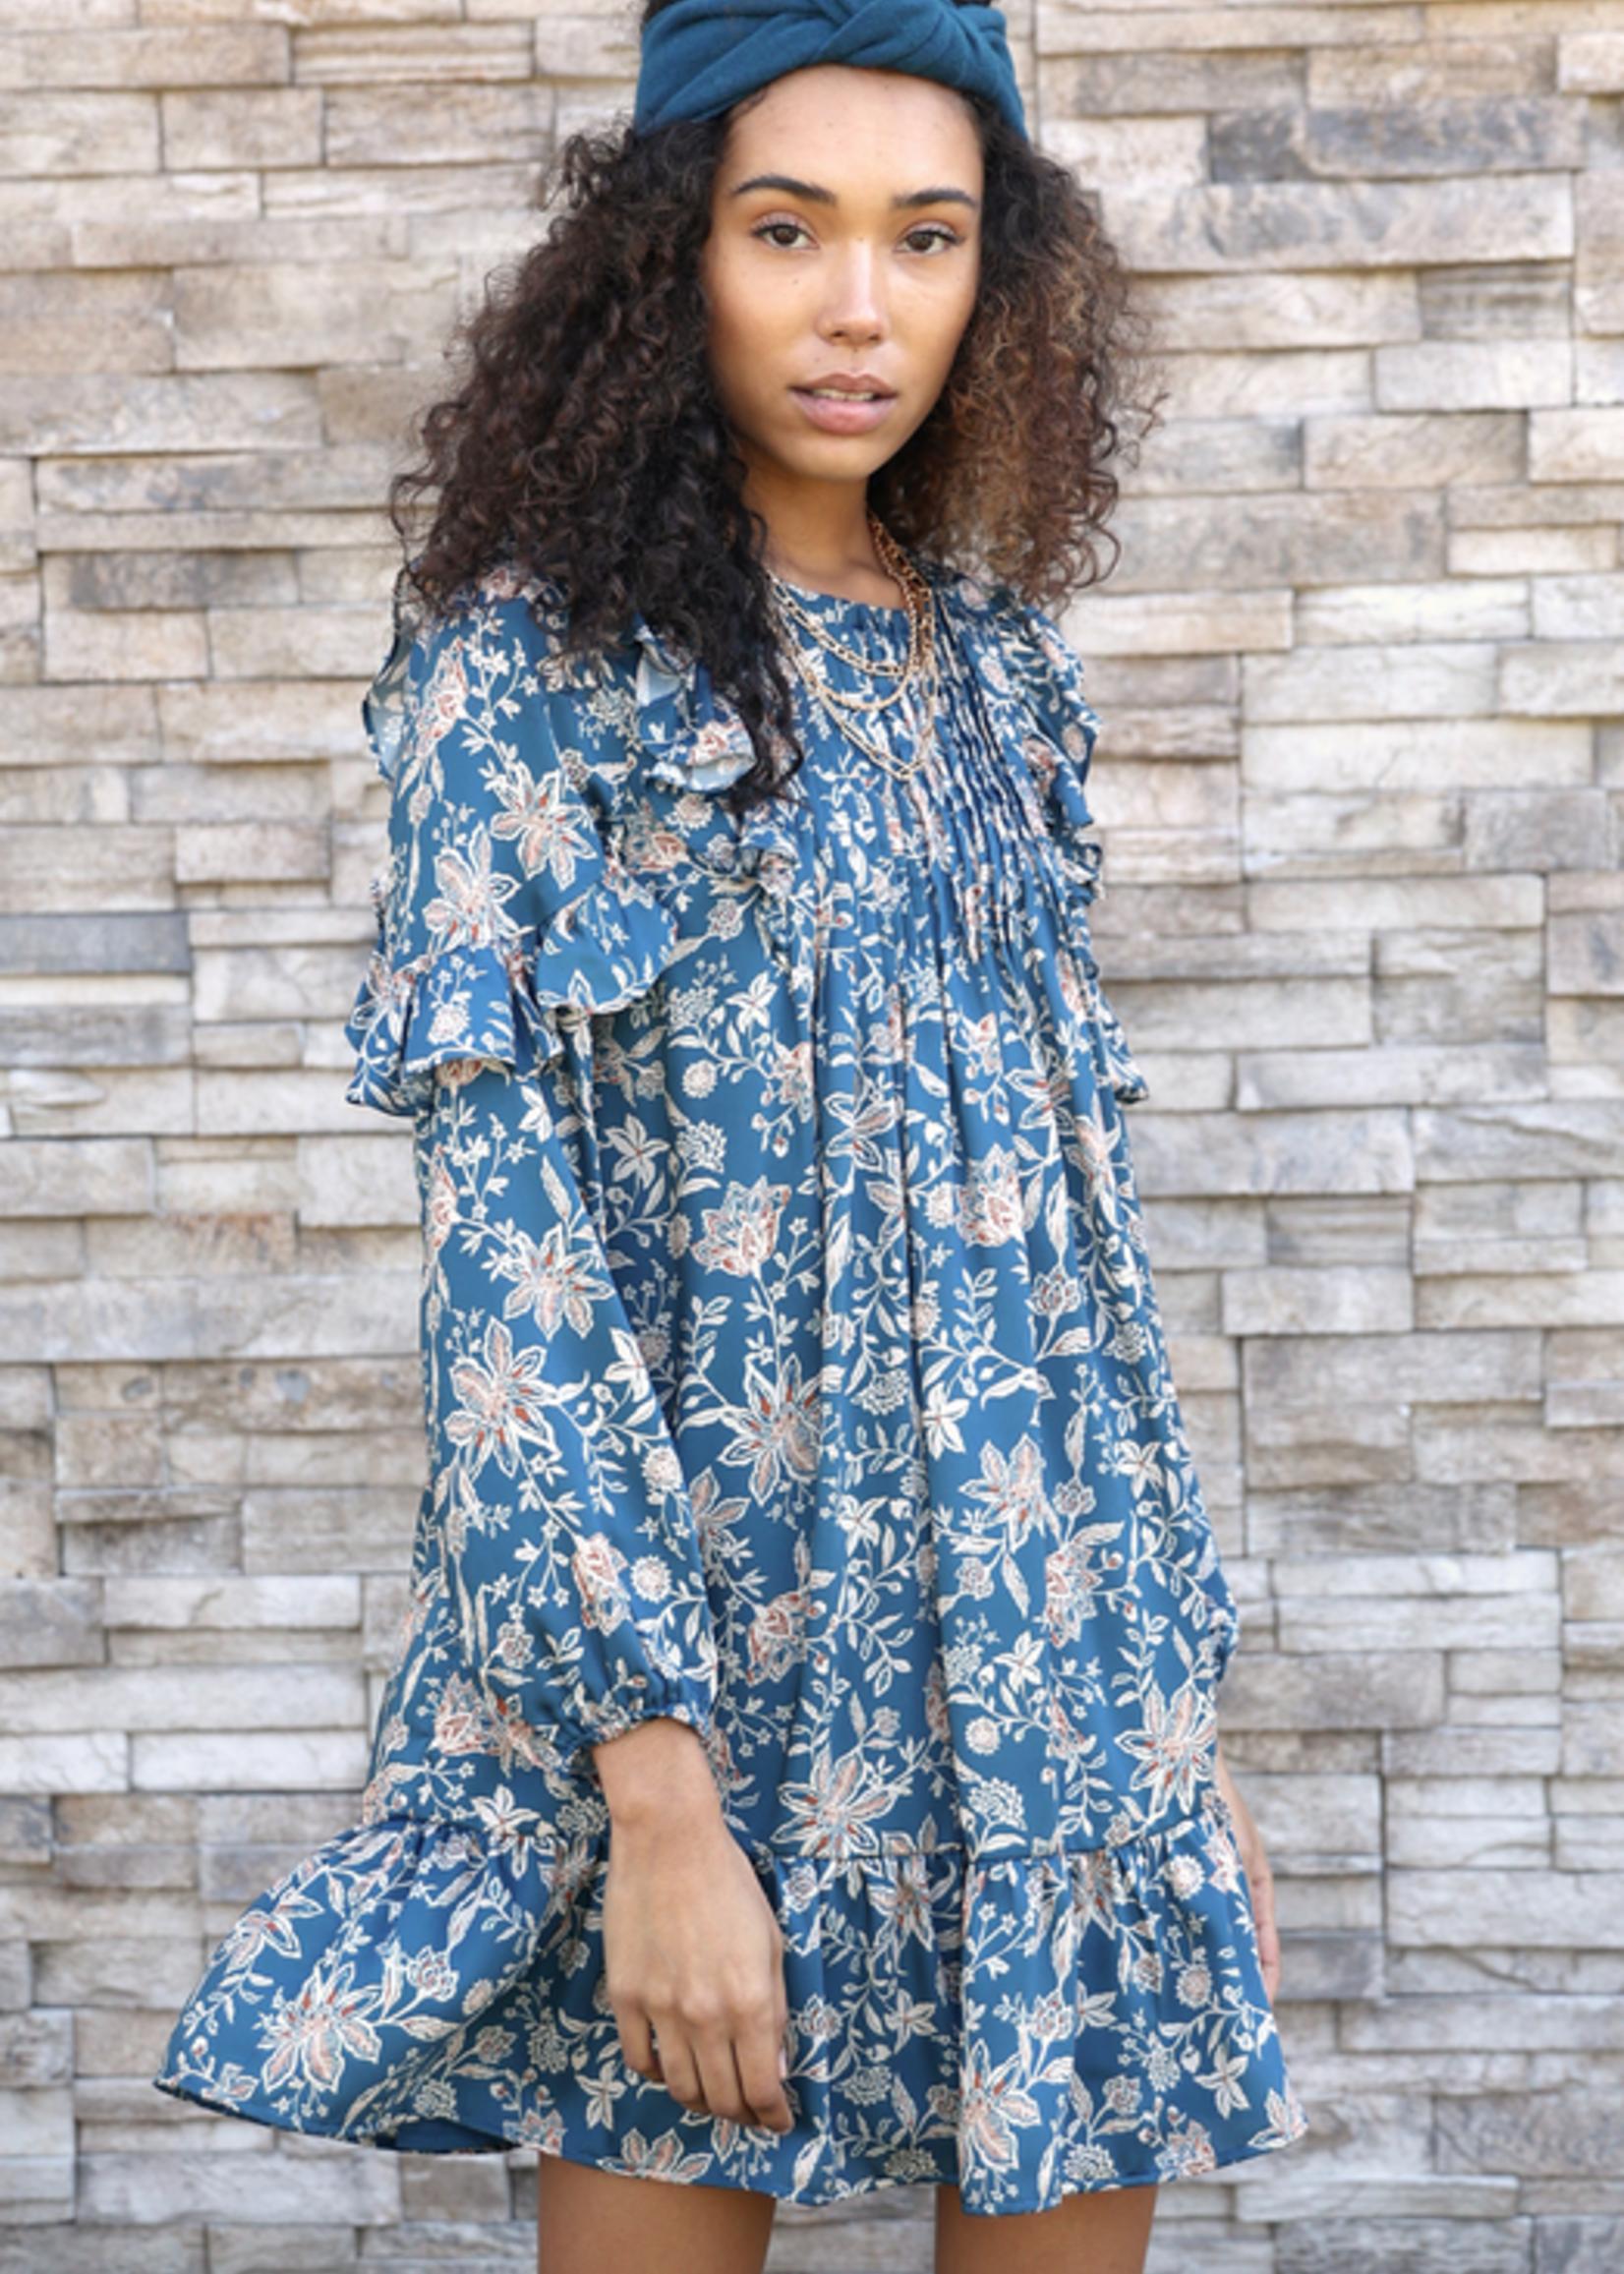 Elitaire Boutique Ami Pintuked Popover Dress